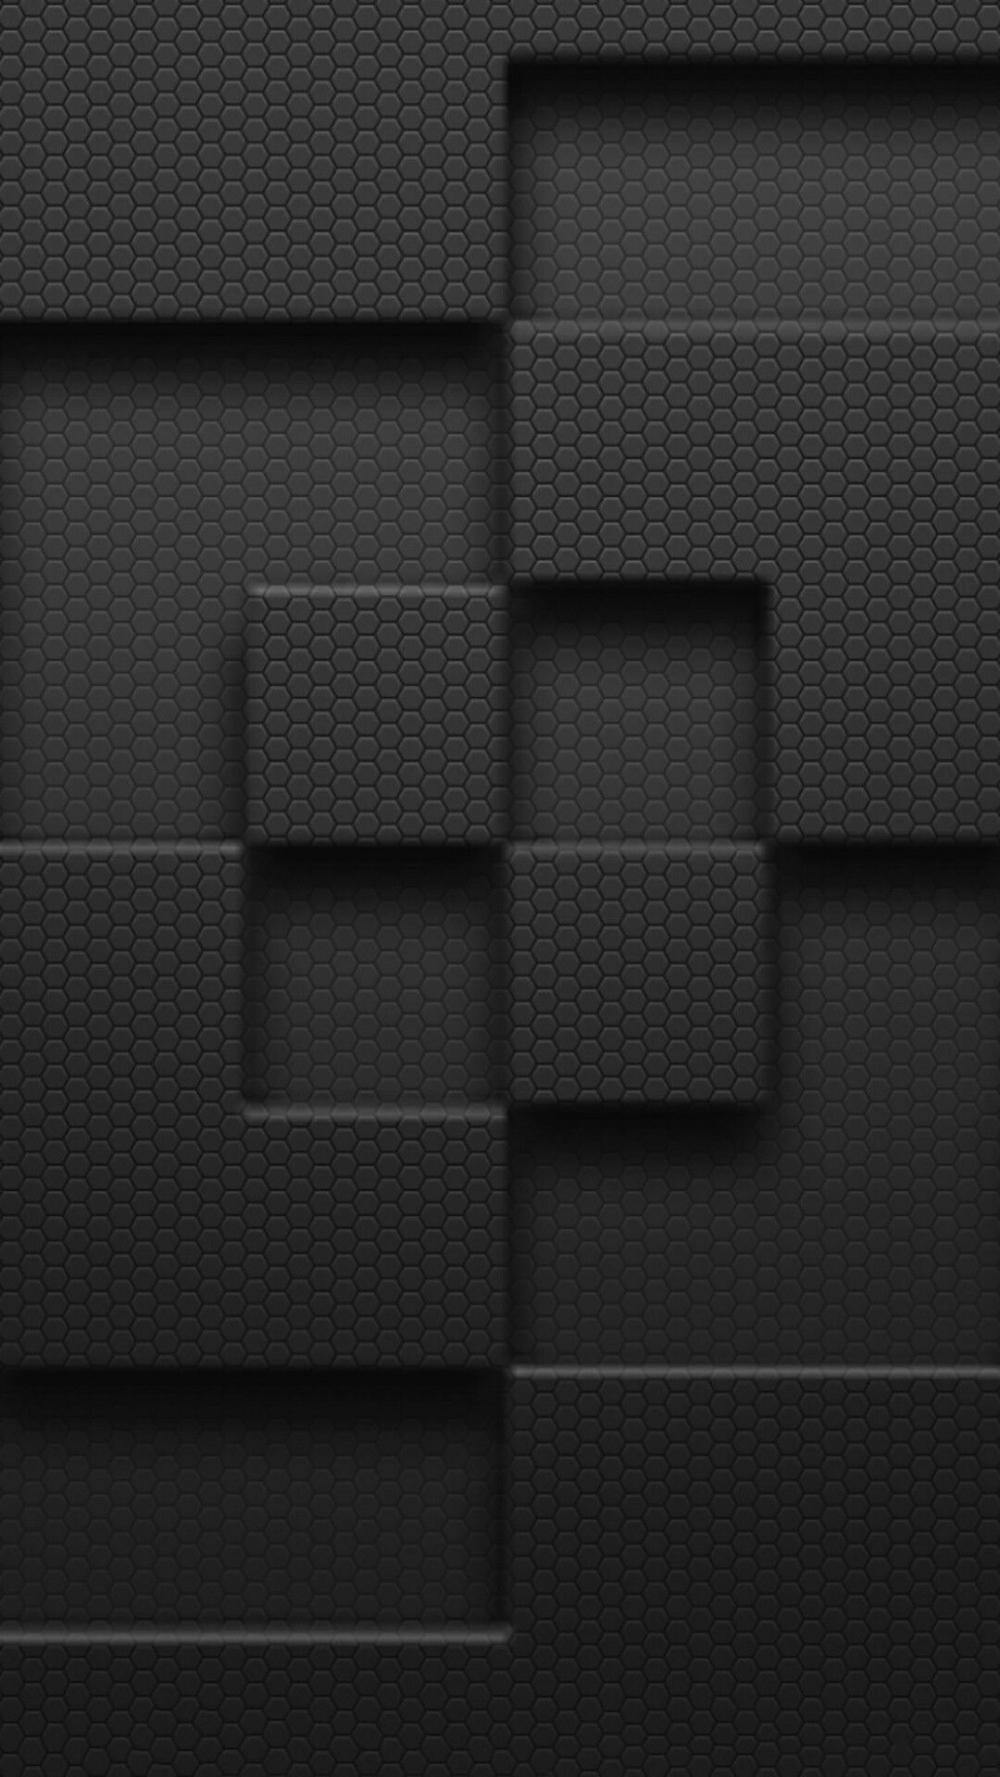 Pin By Wodo On Schwarz Black Geometric Wallpaper Graphic Wallpaper Dark Wallpaper